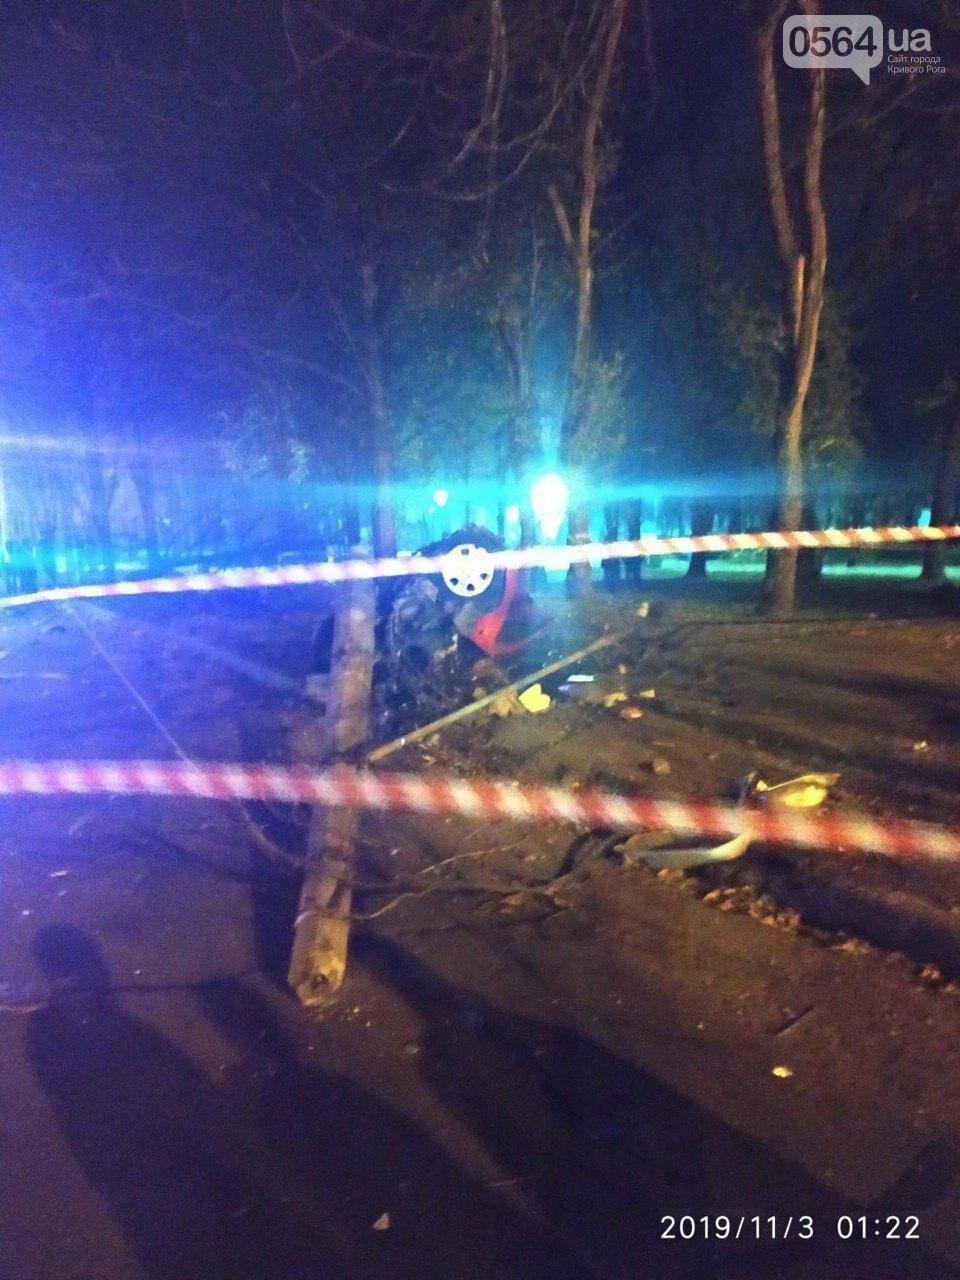 В центре Кривого Рога иномарка снесла фонарный столб и дерево и разлетелась на части, - ФОТО, фото-1